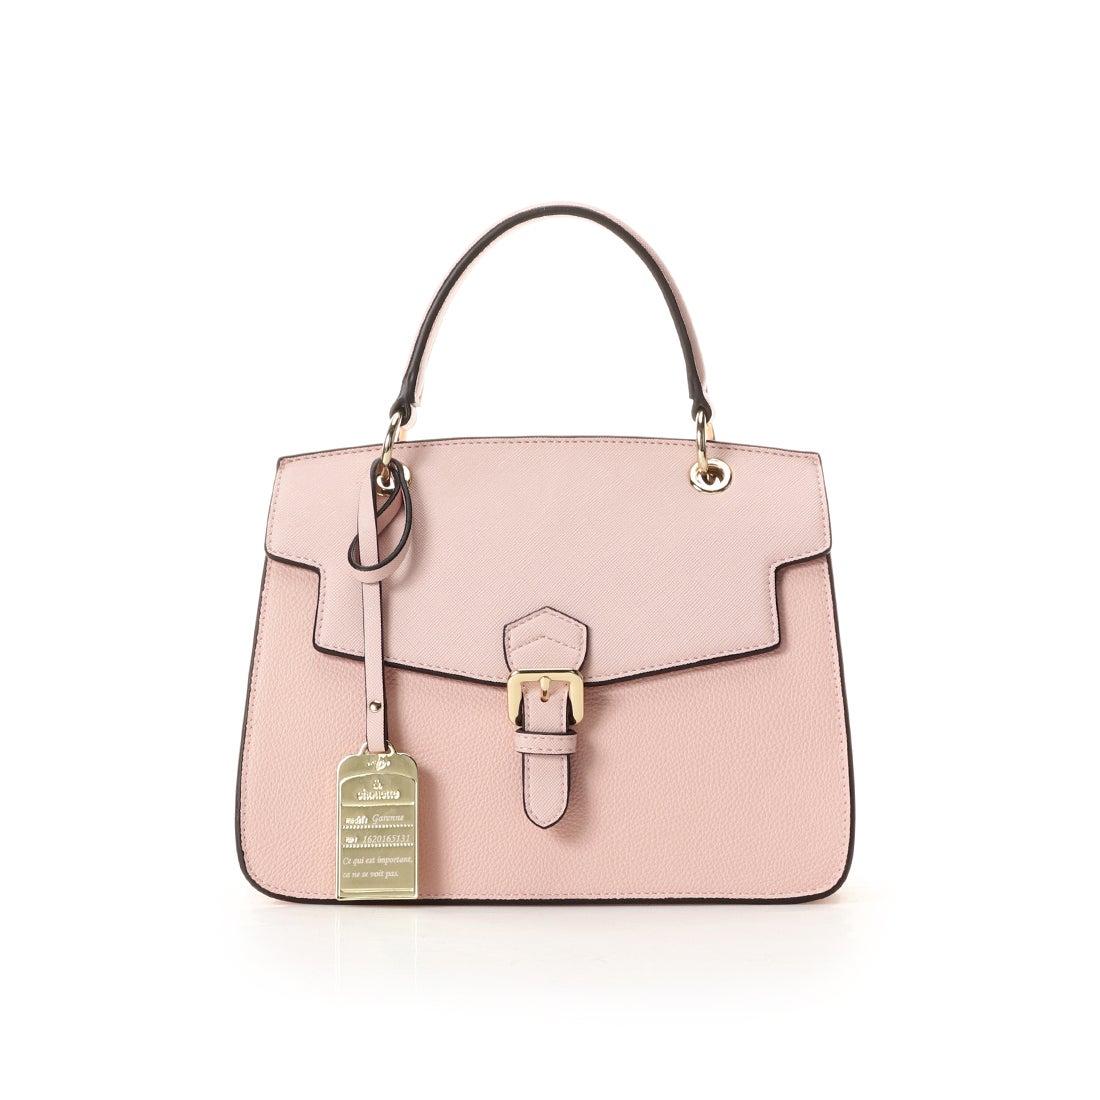 0ef4de9d1401 & chouette &シュエット 1ハンドルベルトデザインバッグ ピンク -靴&ファッション通販 ロコンド〜自宅で試着、気軽に返品